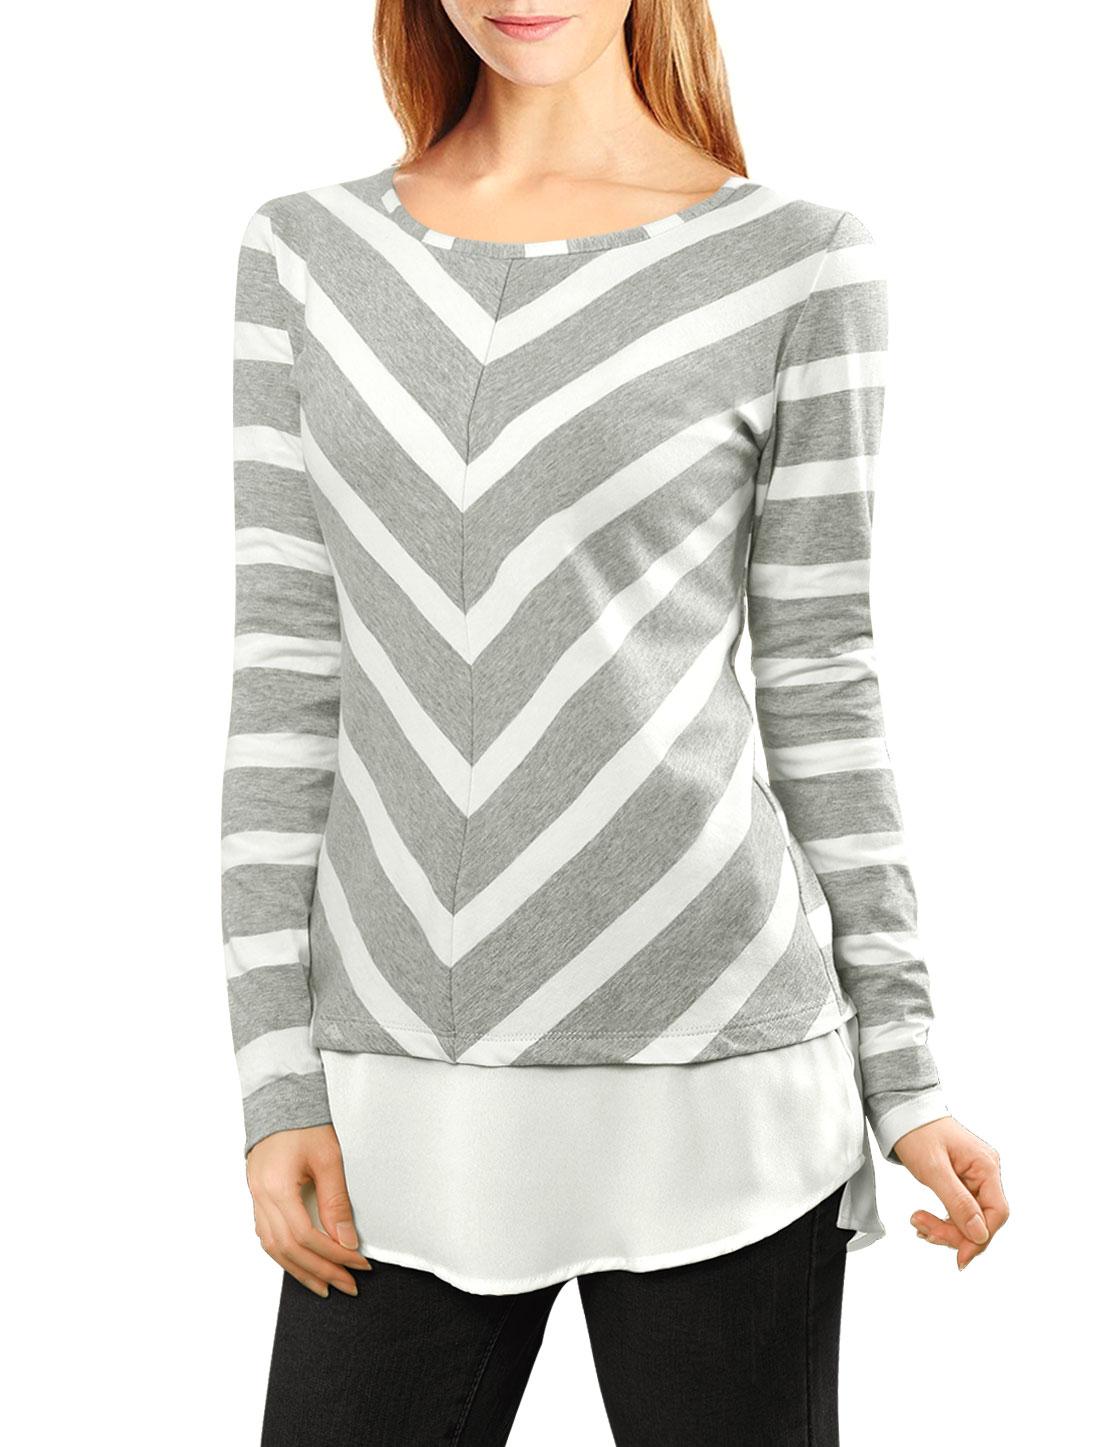 Women Layered Tunic Top in Striped and Chevron Print Gray S